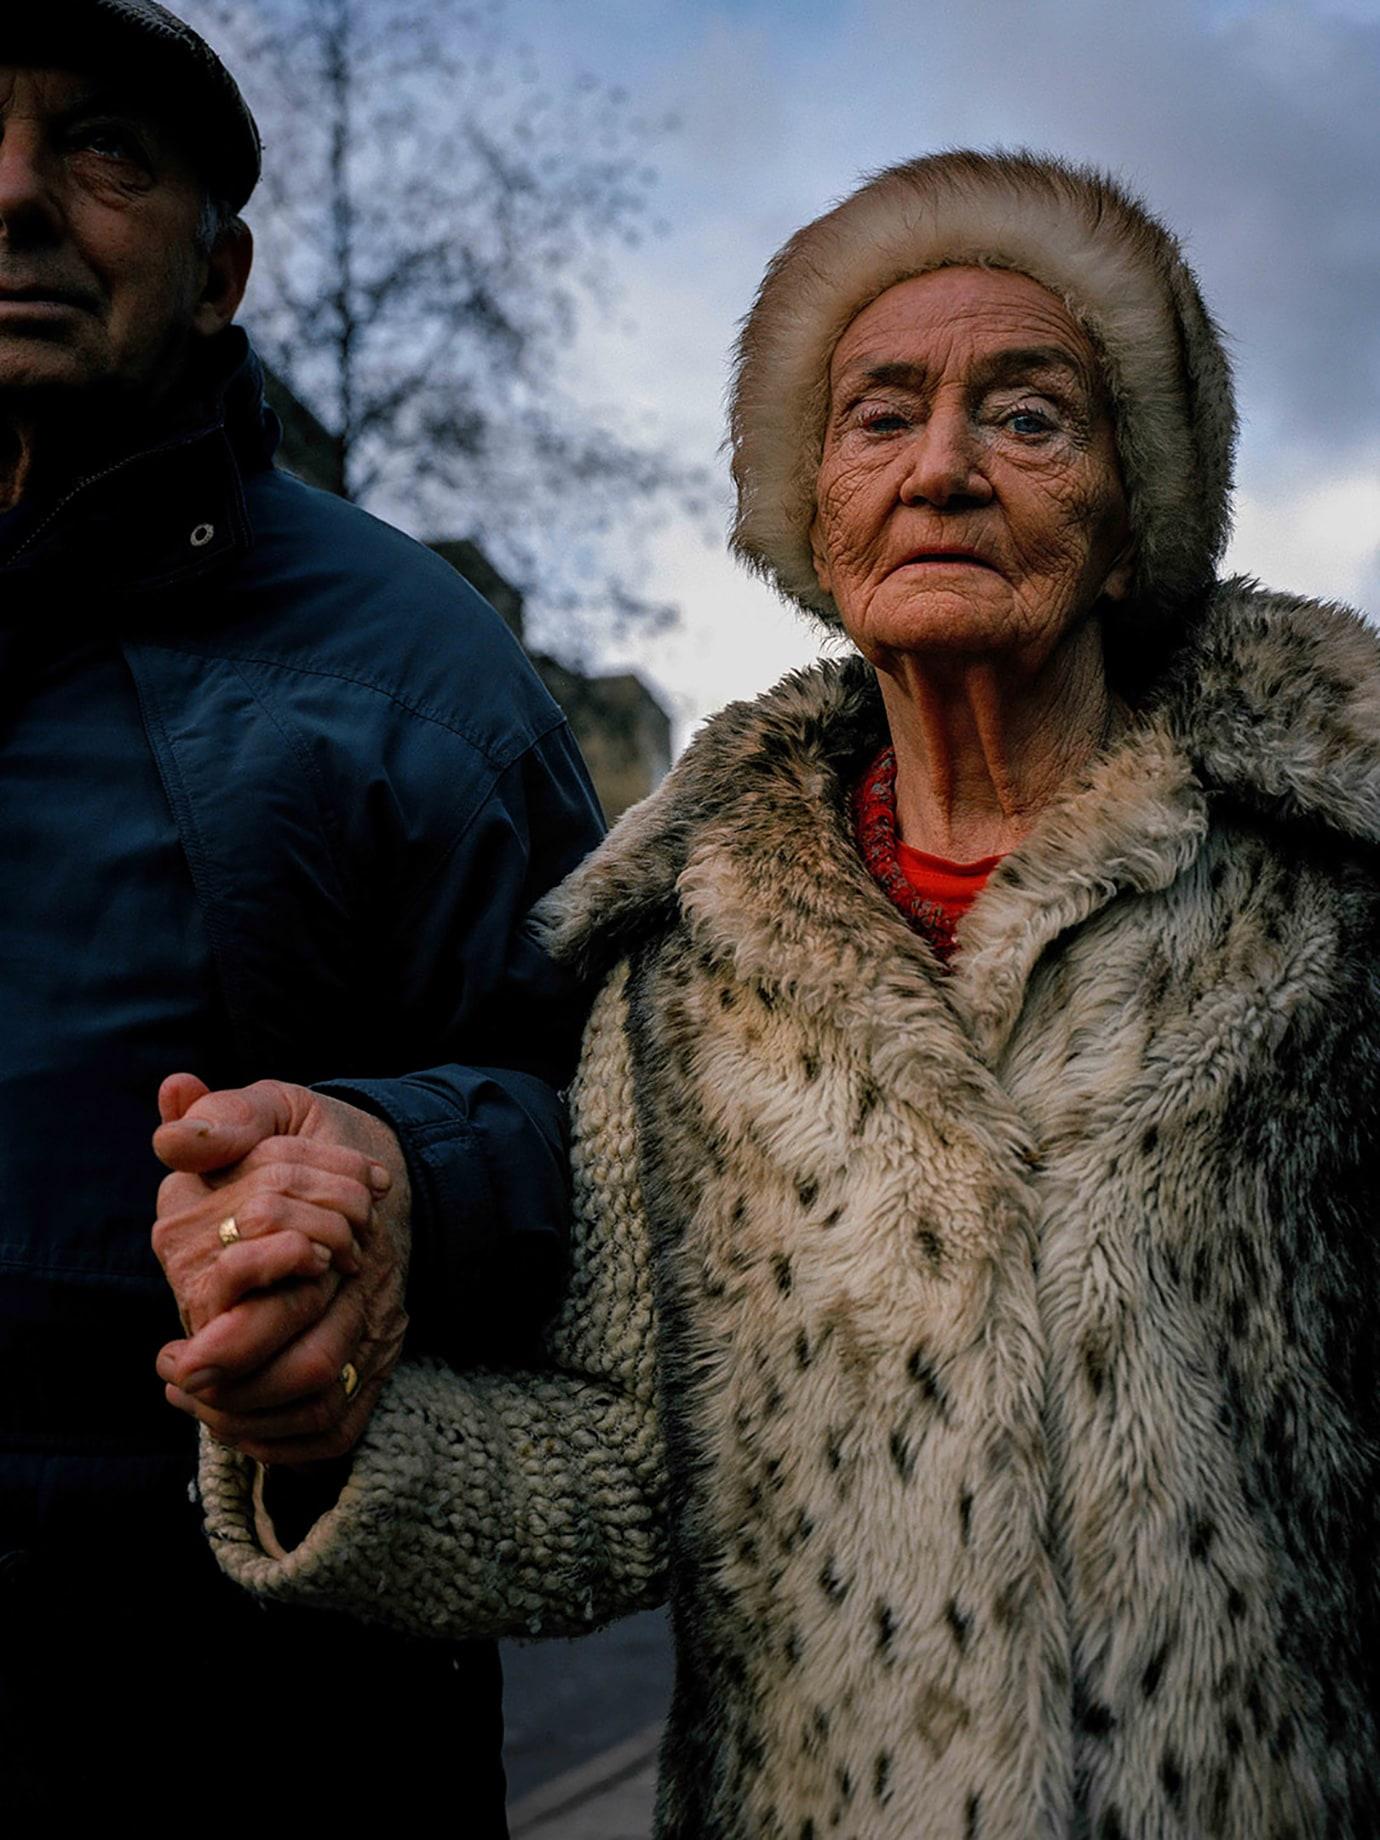 An elderly couple arm in arm.